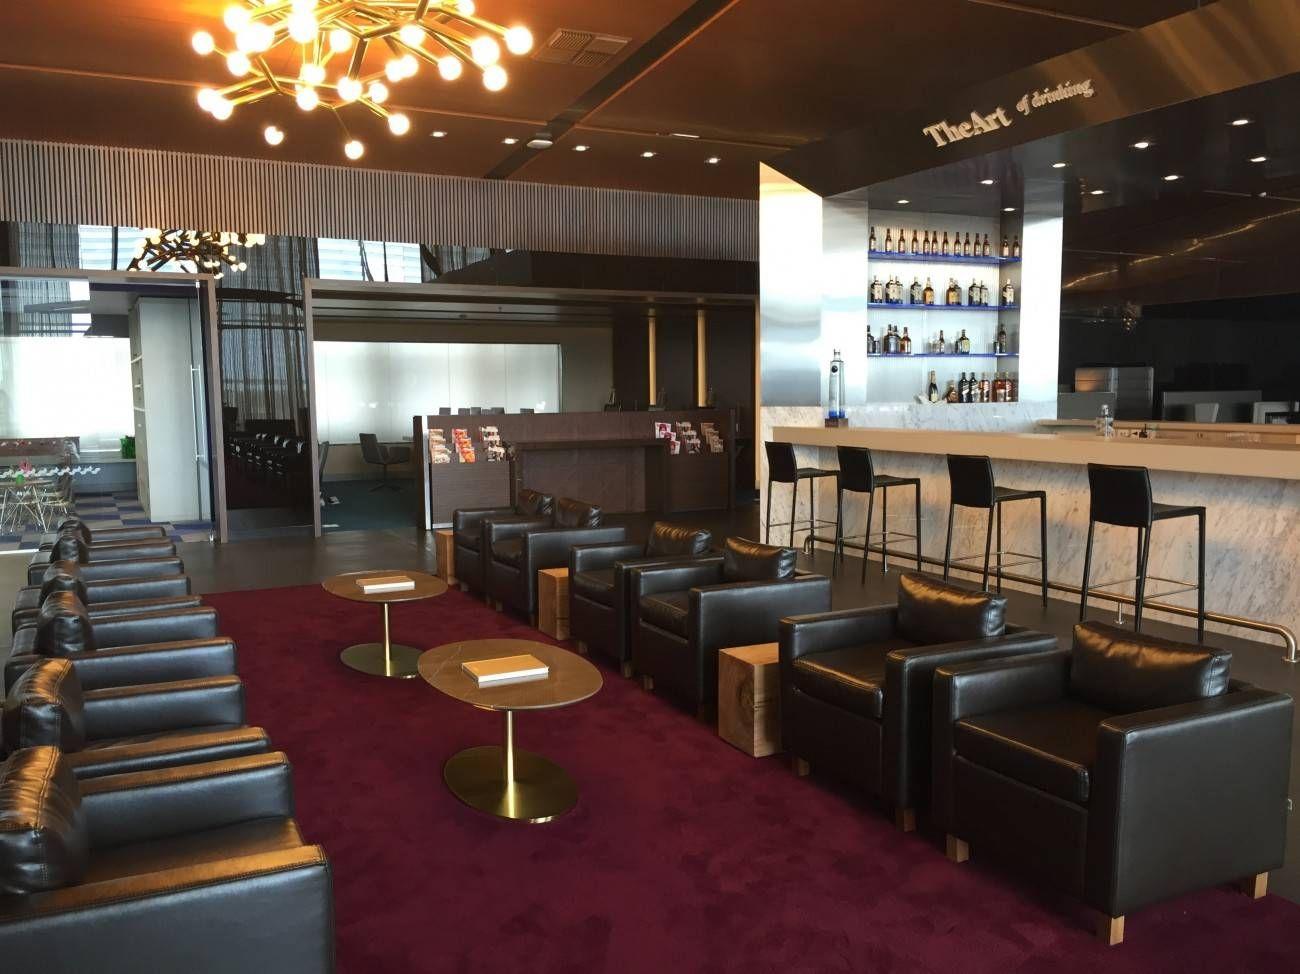 sala vip aeroportos vip club aeroporto de brasilia bsb. Black Bedroom Furniture Sets. Home Design Ideas